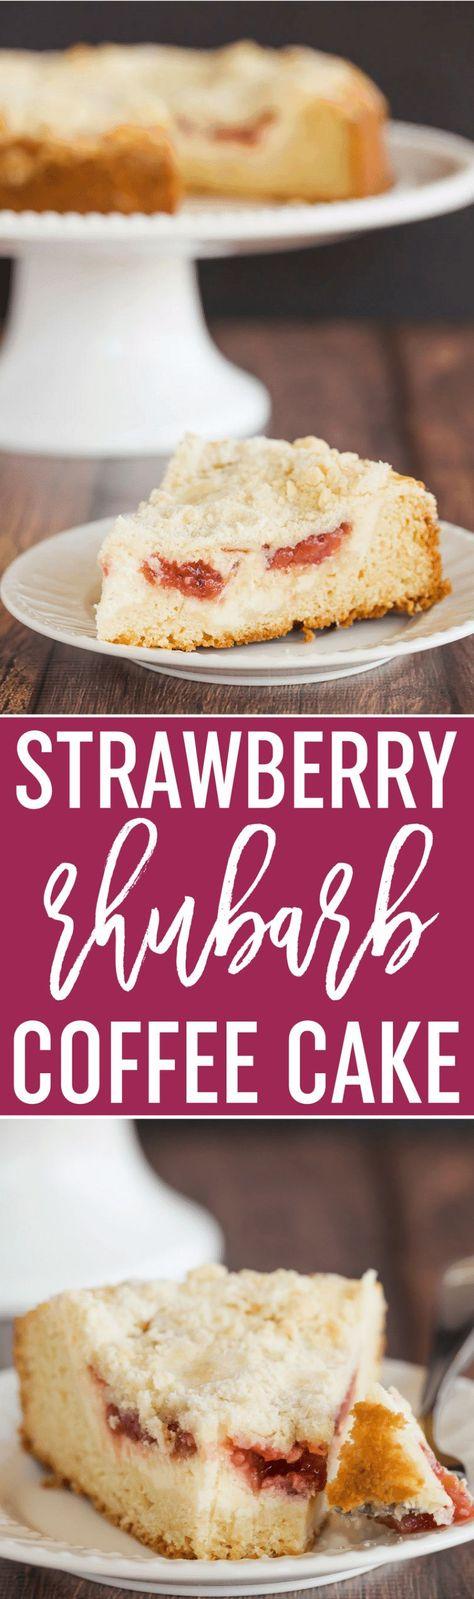 Strawberry Rhubarb Coffee Cake   Brown Eyed Baker